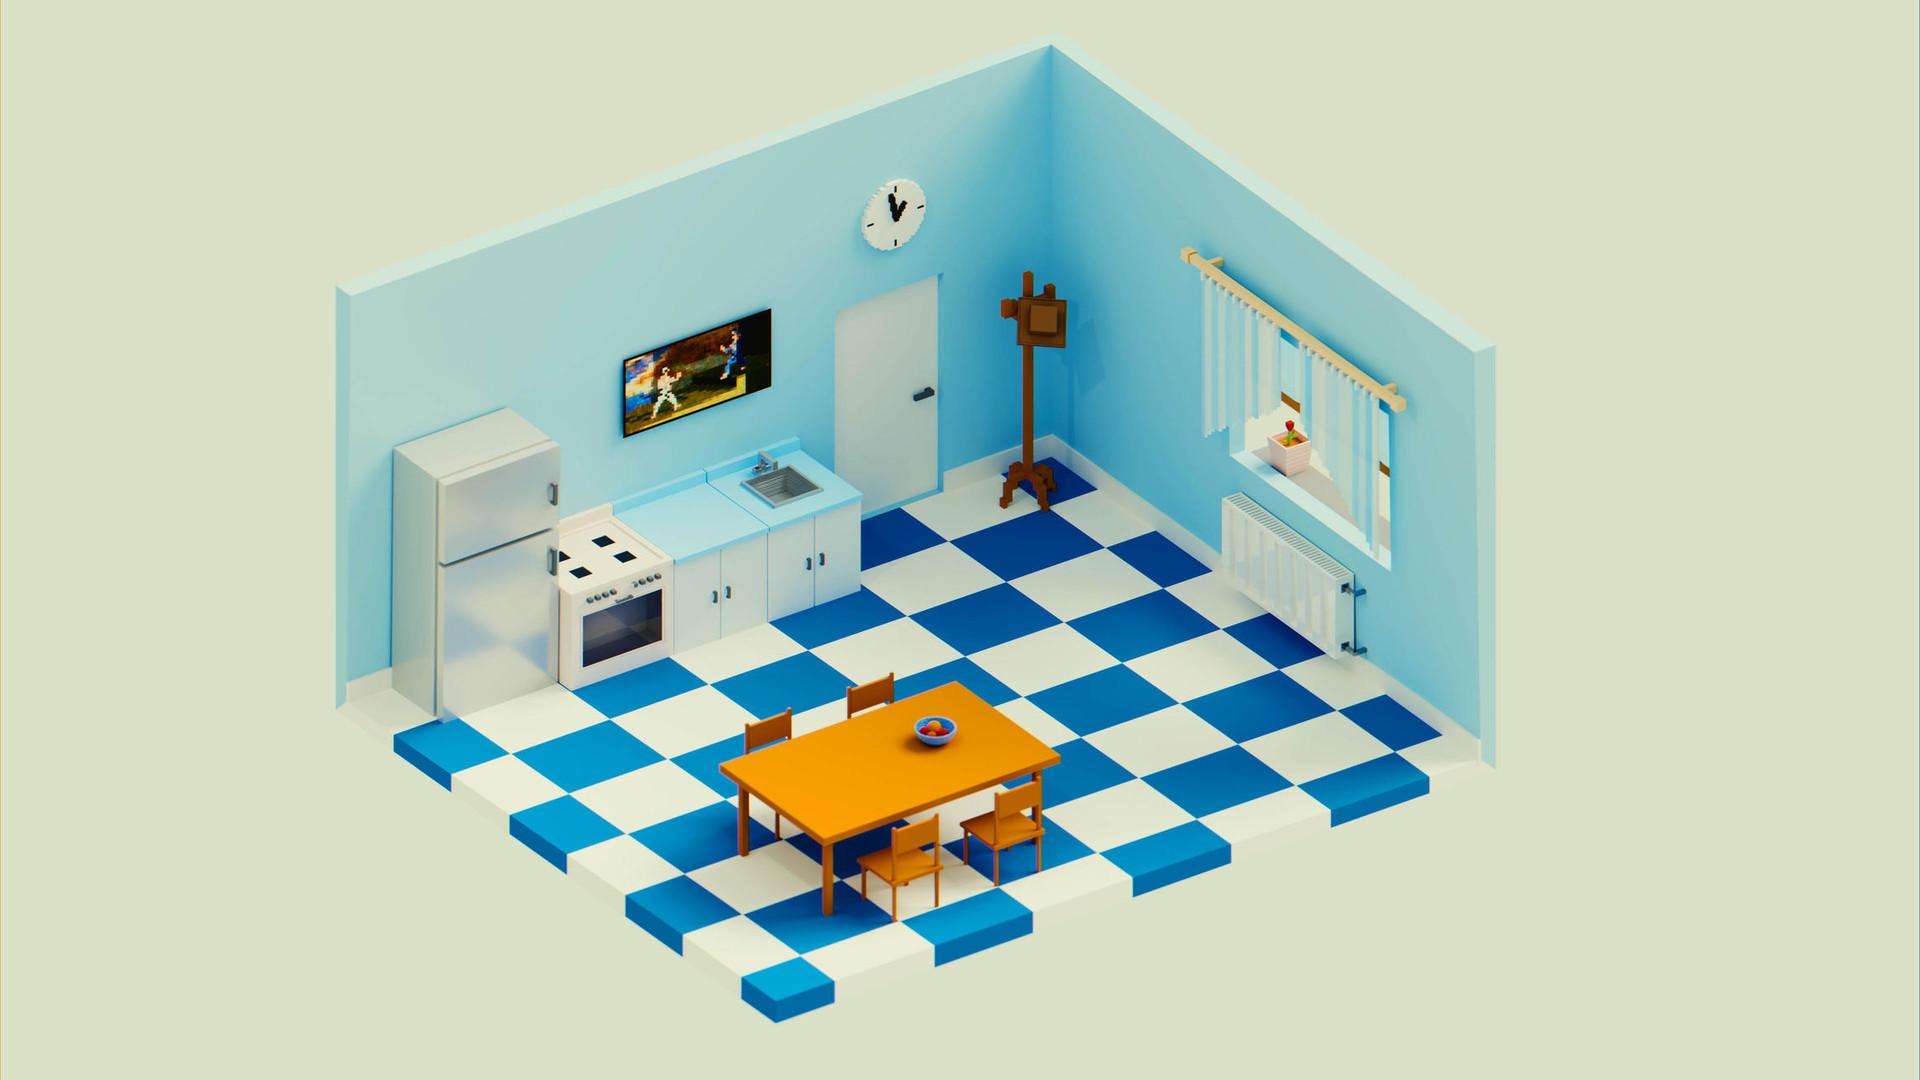 ArtStation - Voxel Kitchen, Mateusz Madoń